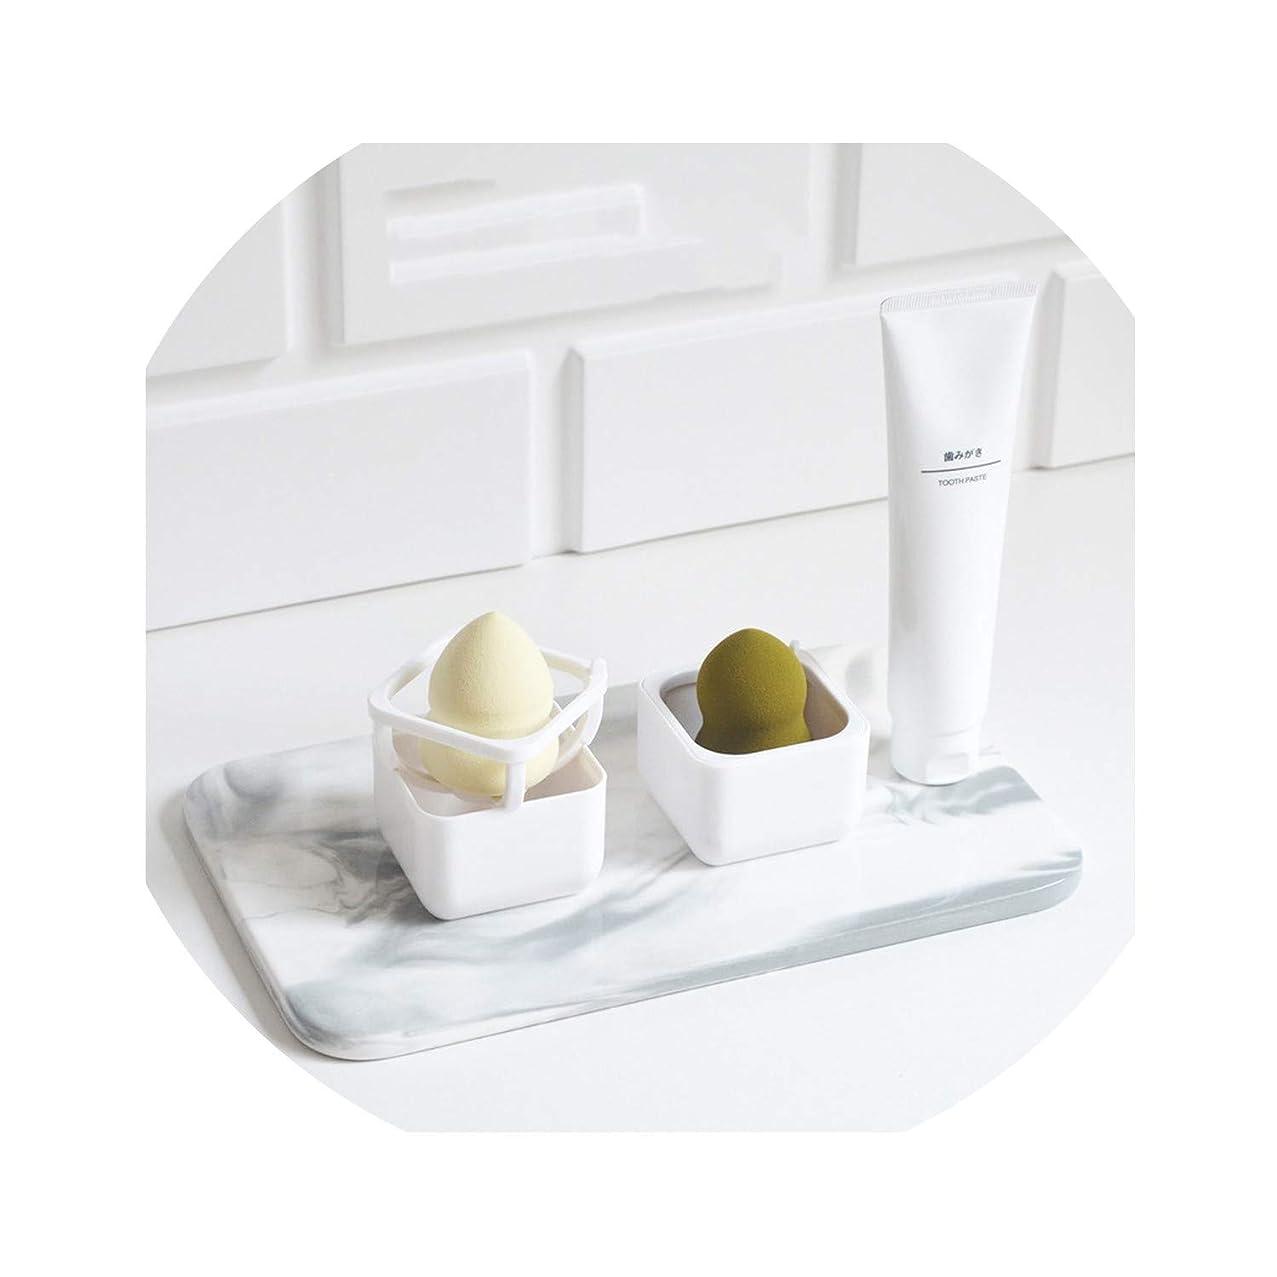 Makeup Puff Sponge Holder Beauty Makeup Powder Puff Storage Rack Beauty Egg Sponge Drying Stand Holder